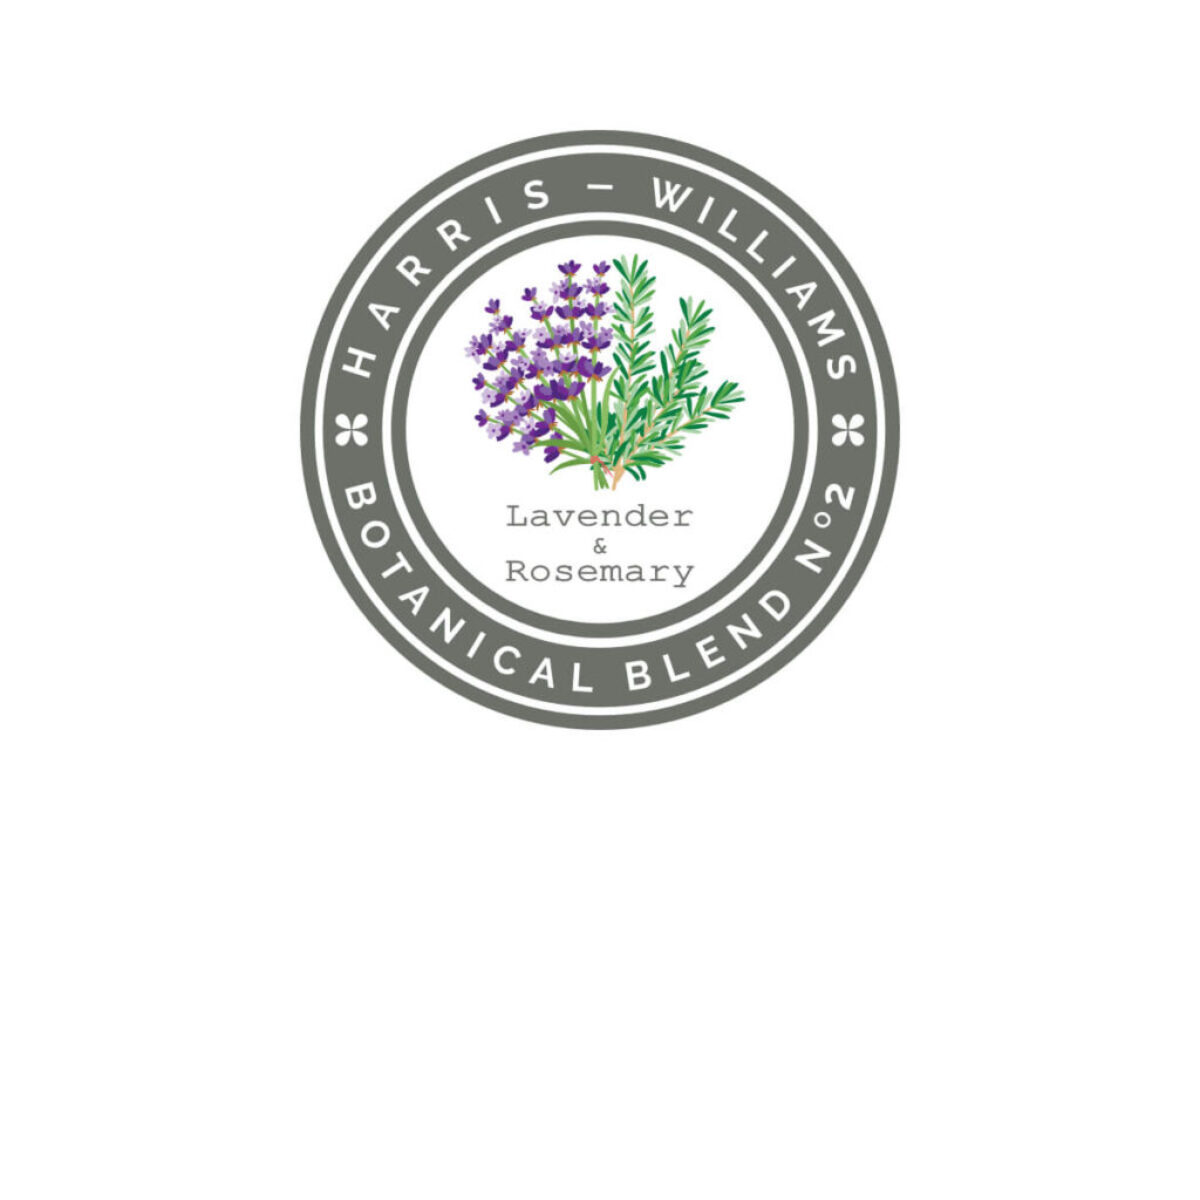 Botanical Blend No 2 Lavender & Rosemary